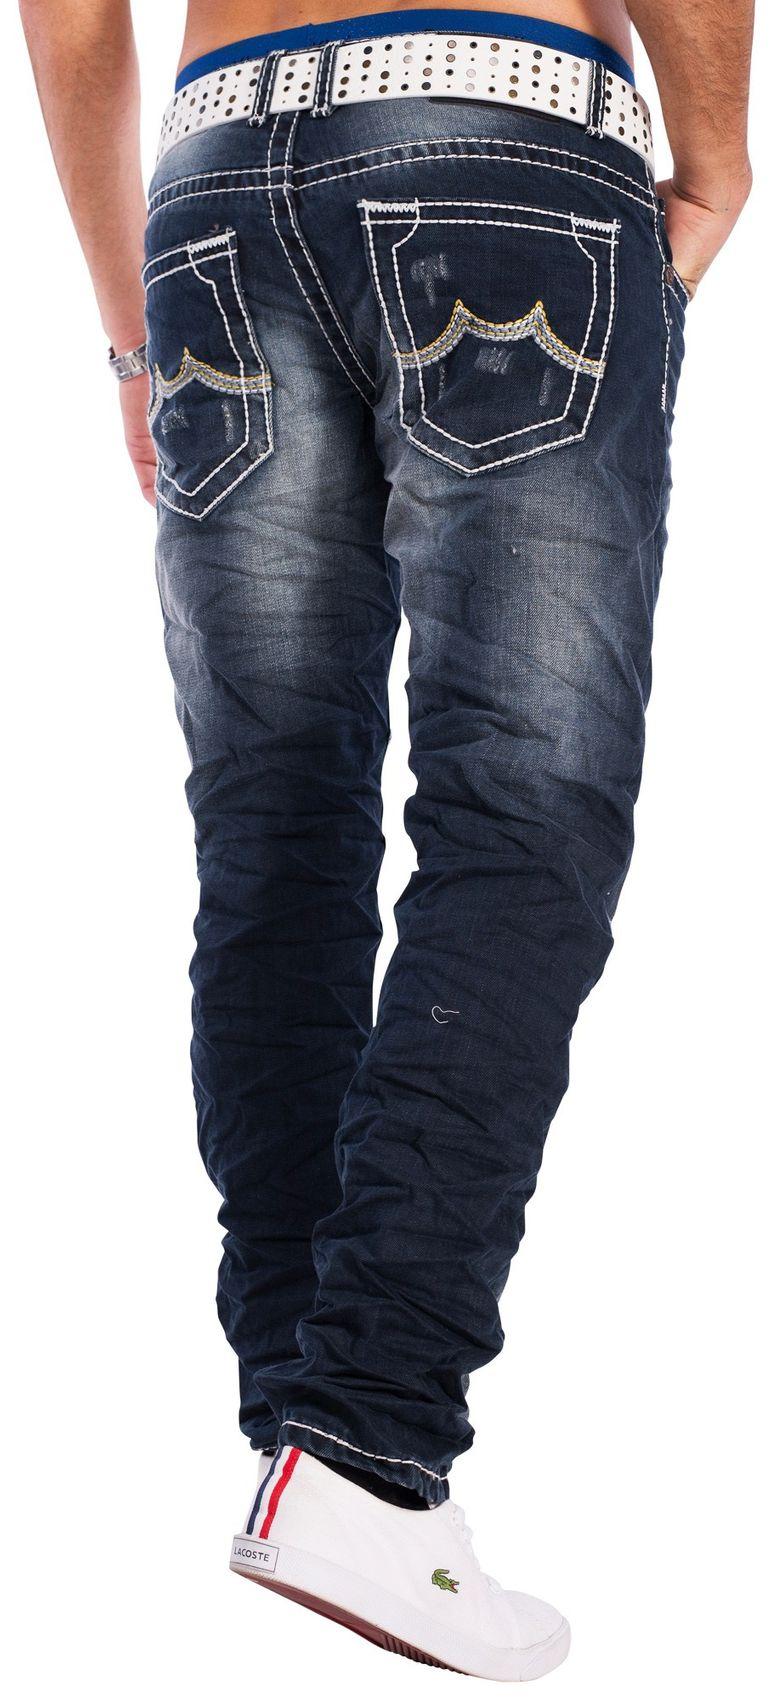 herren jeans turin wei e ziern hte 1431. Black Bedroom Furniture Sets. Home Design Ideas